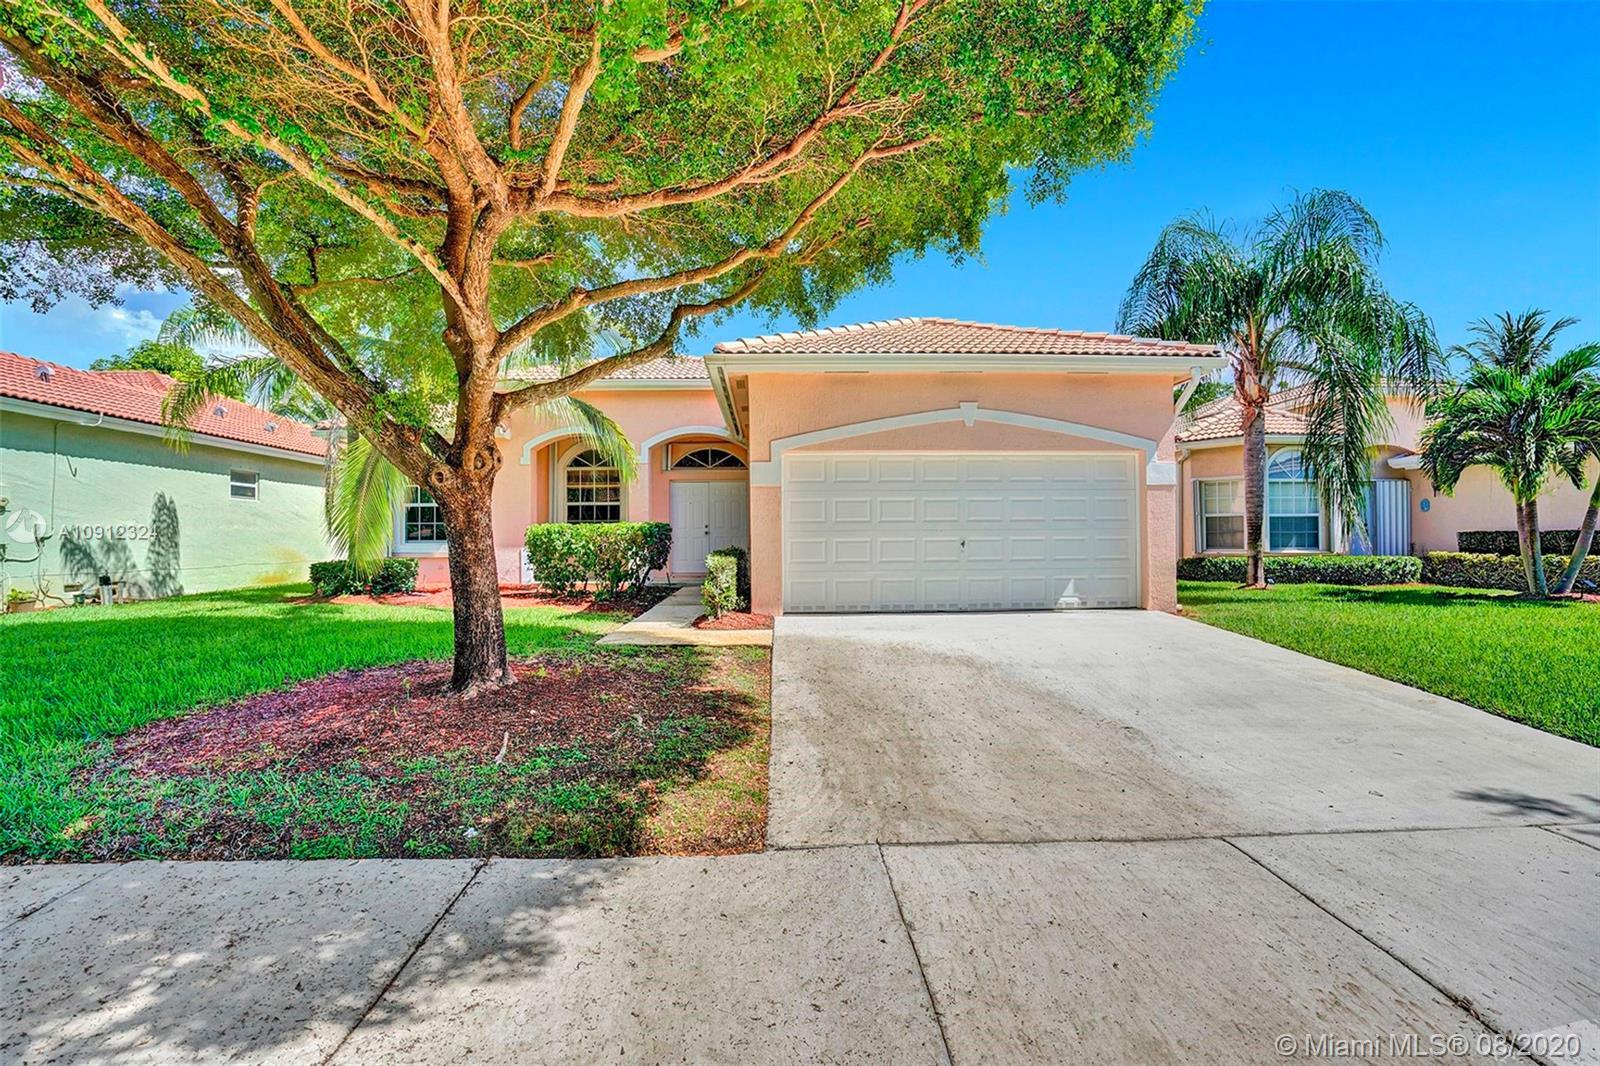 2435 Se 4th Pl Property Photo